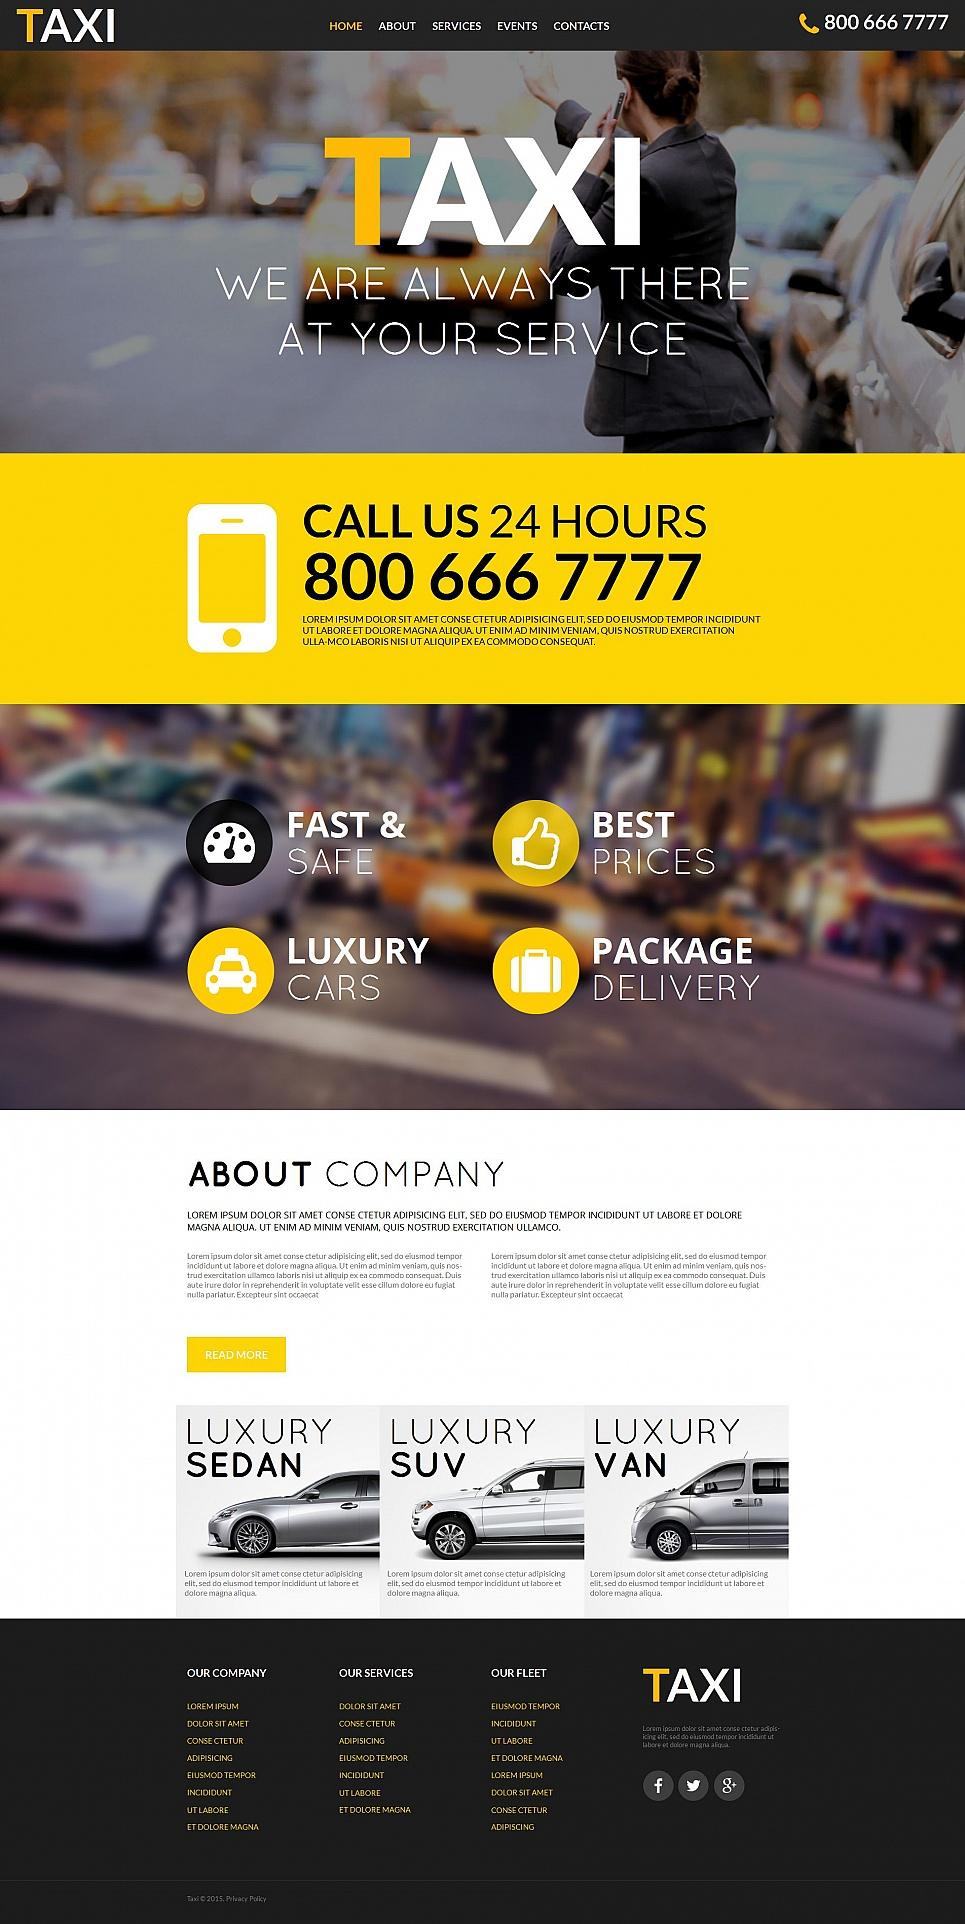 MotoCMS HTML Vorlage #54772 aus der Kategorie Verkehrsmittel - image